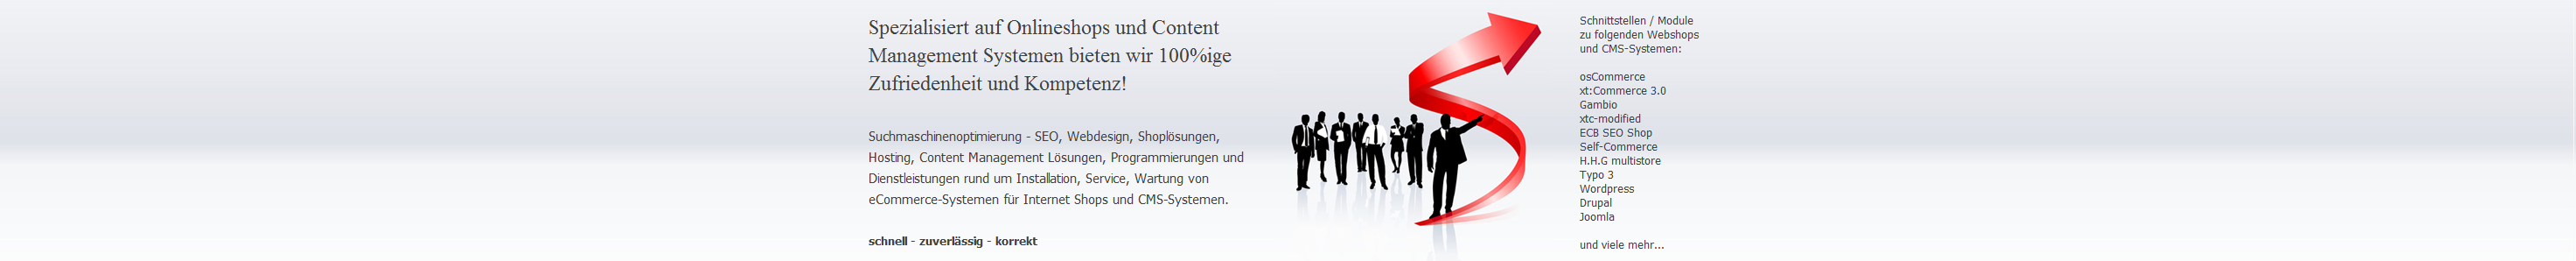 eWebagentur.de - CMS, eCommerce, SEO, SEM, iOS App, Warenwirtschaft